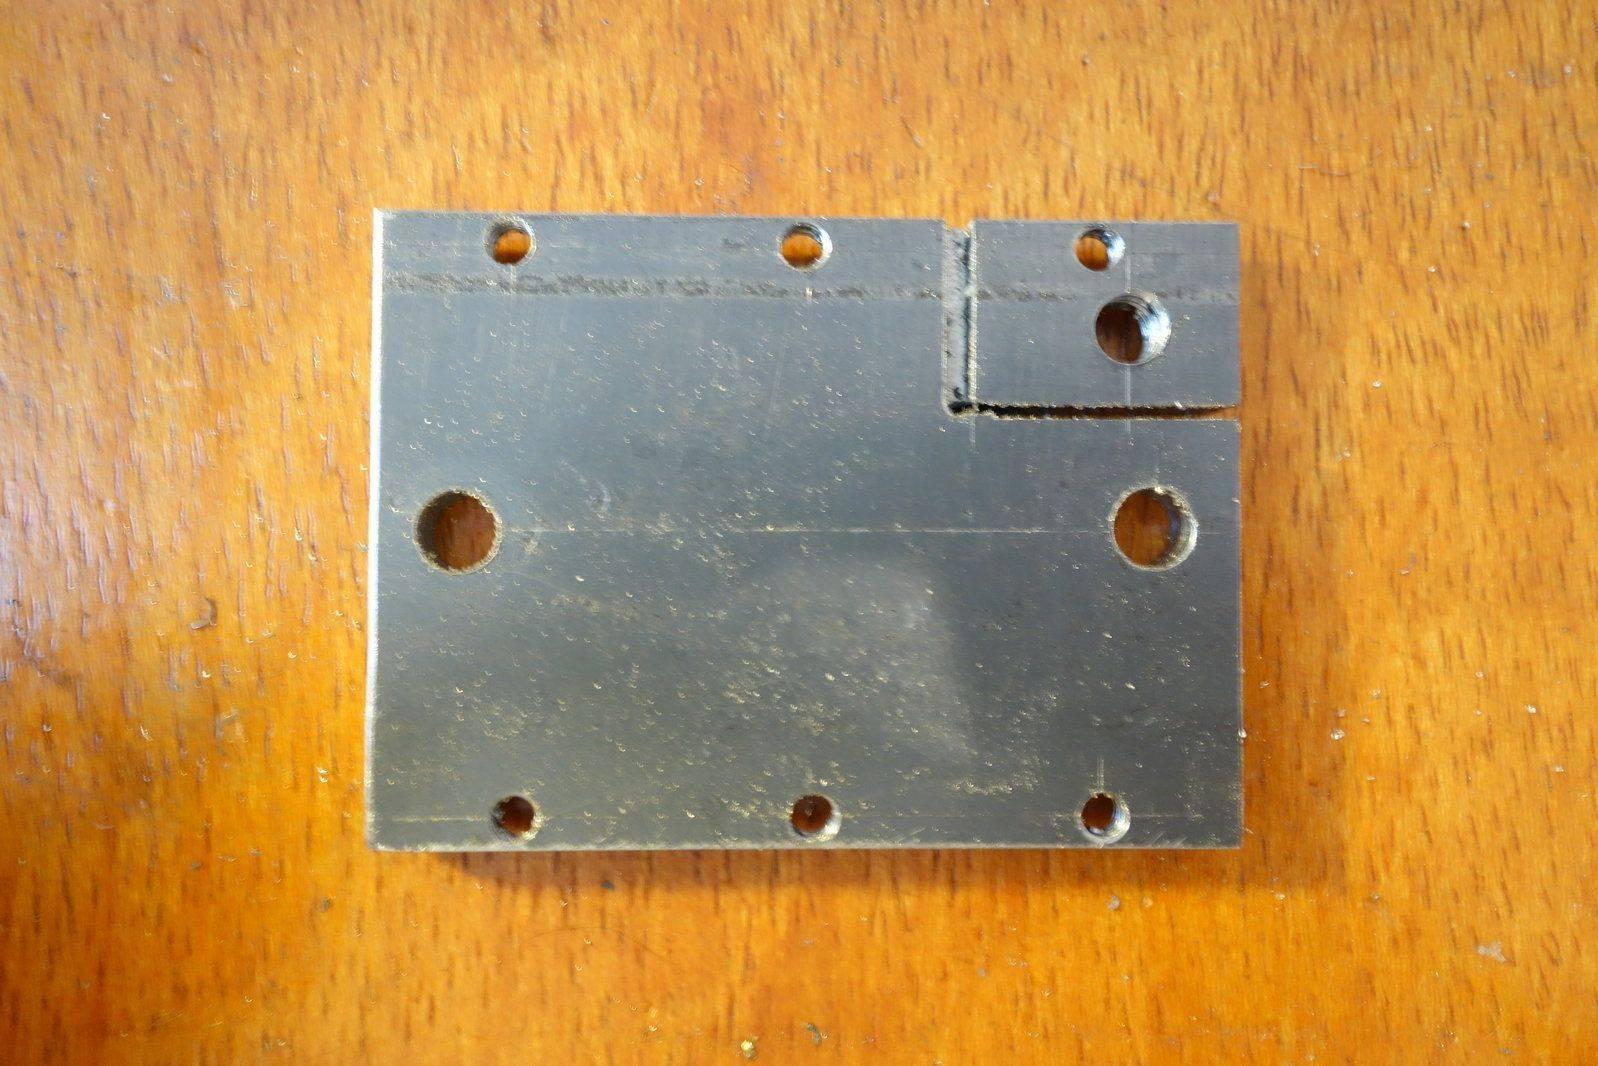 DSC04499.JPG